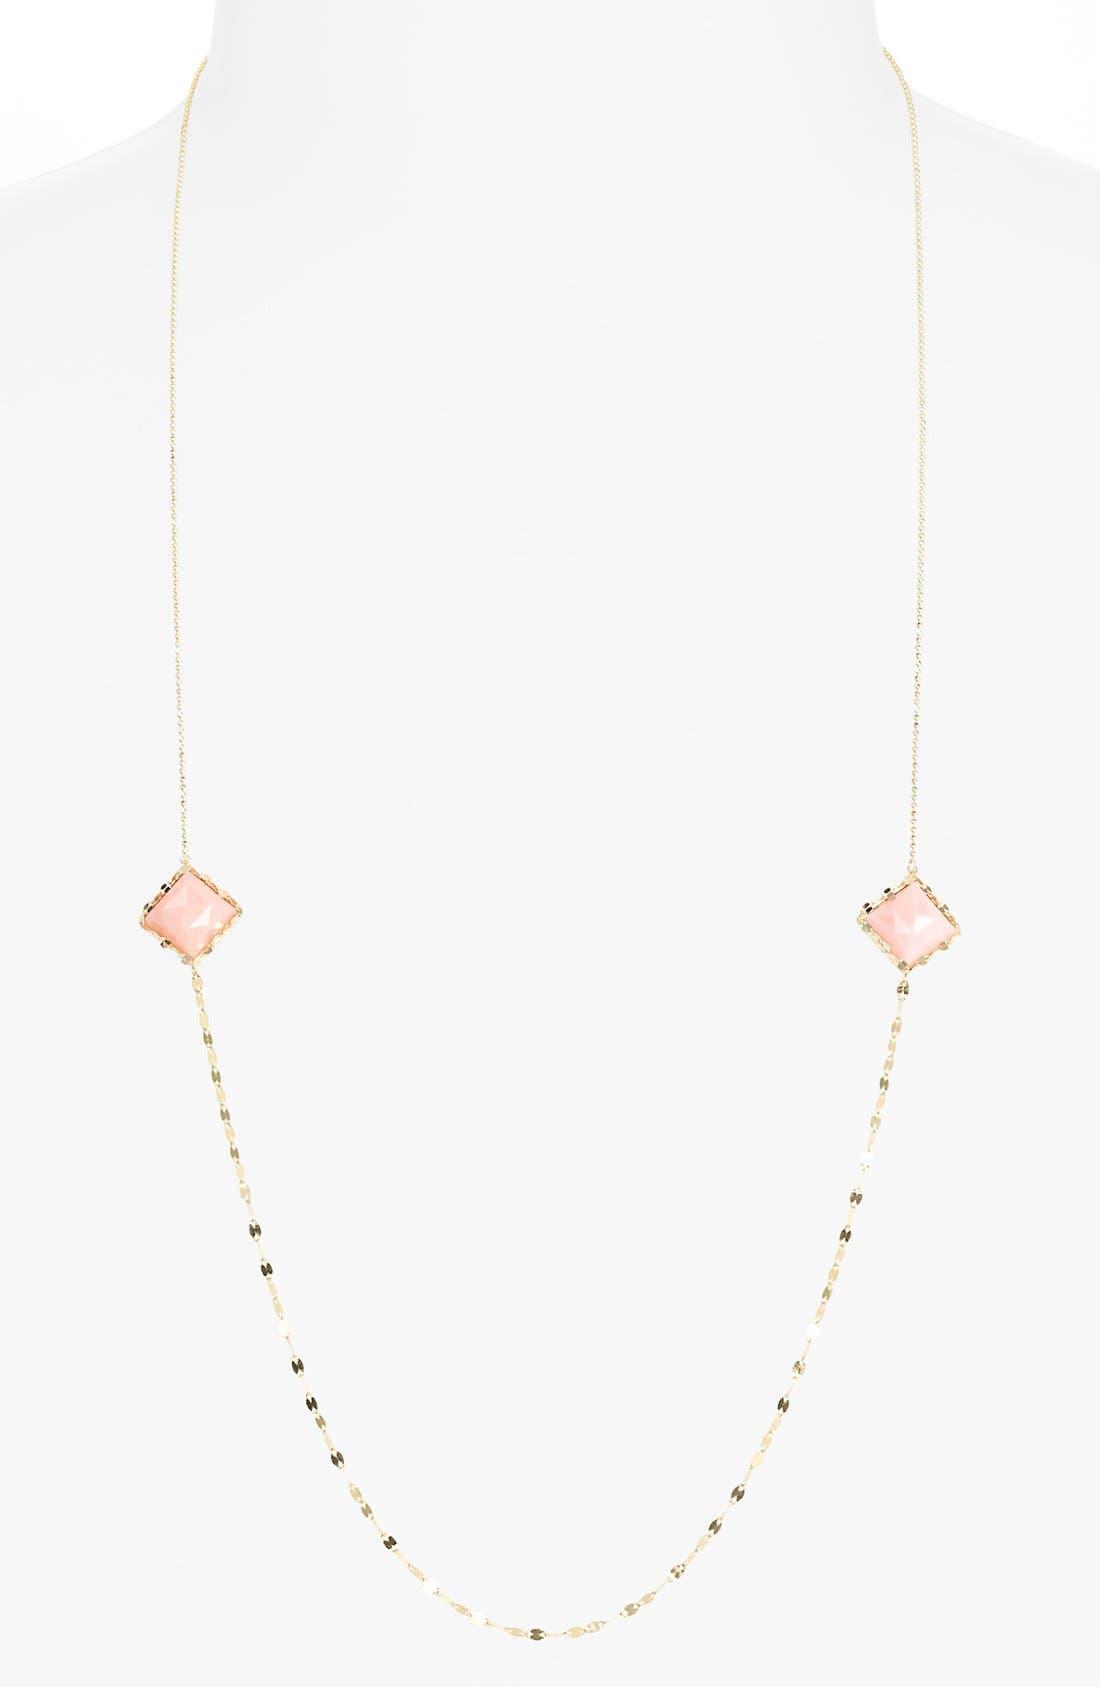 Alternate Image 1 Selected - Lana Jewelry 'Blush' Station Necklace